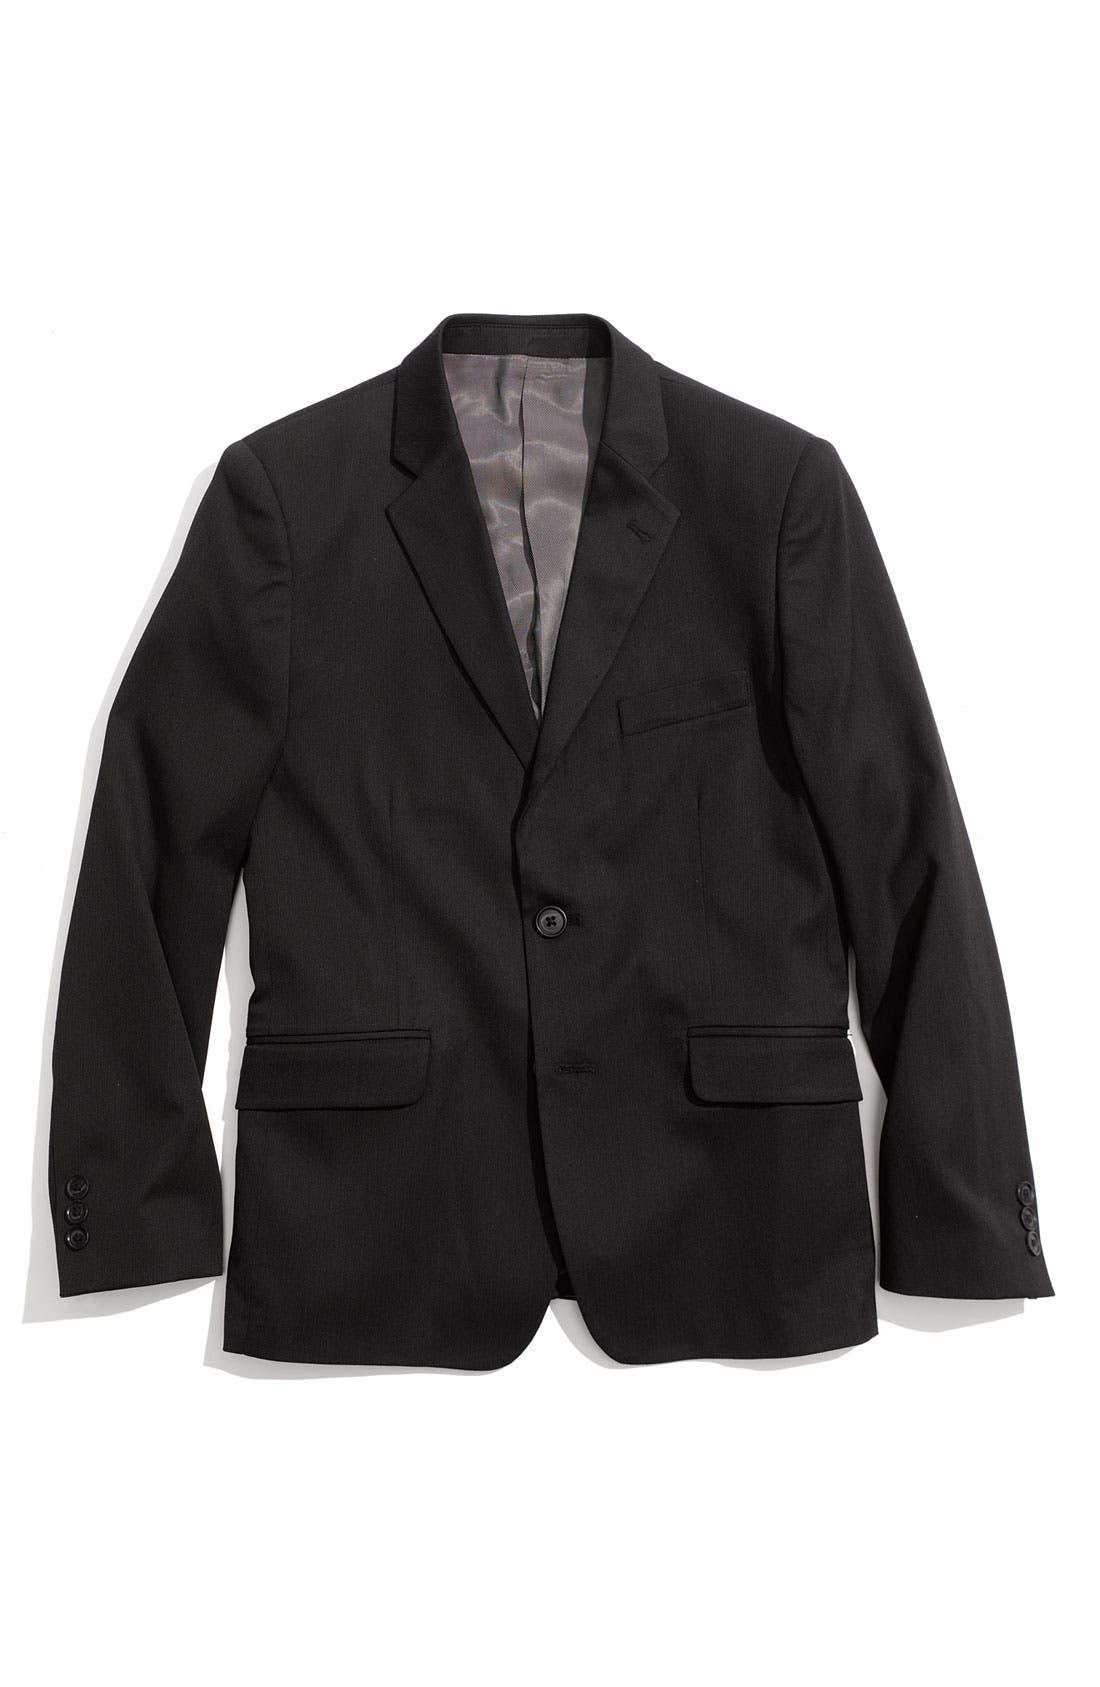 Main Image - C2 by Calibrate Slim Fit Jacket (Big Boys)